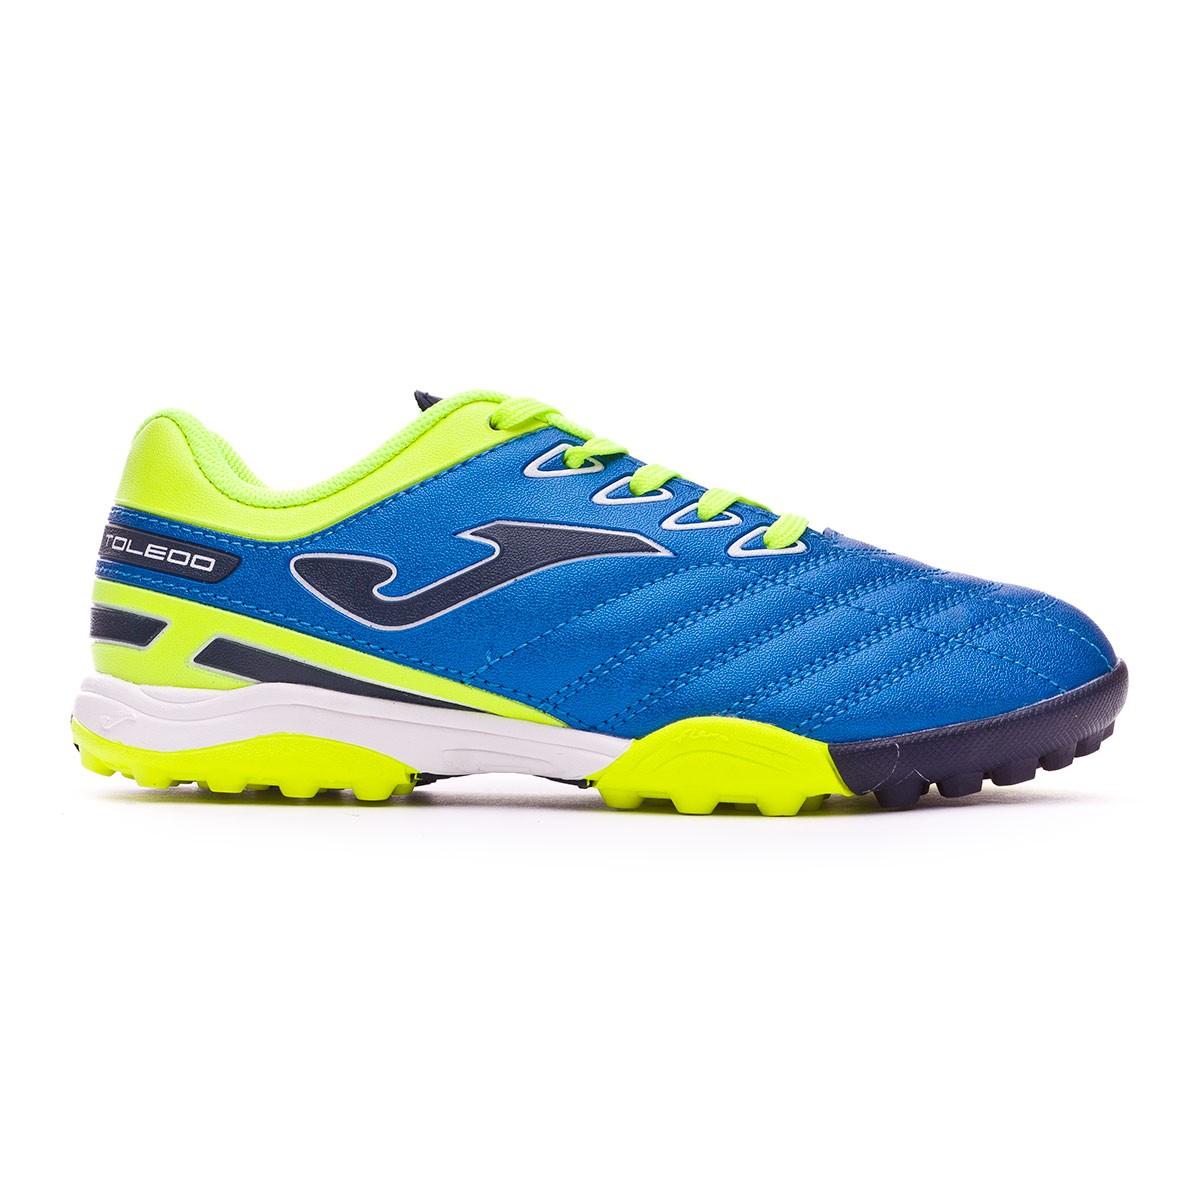 ... Zapatilla Toledo Turf Niño Blue-Lima. CATEGORY. Football boots · Joma  Boots 7a7472f36b846